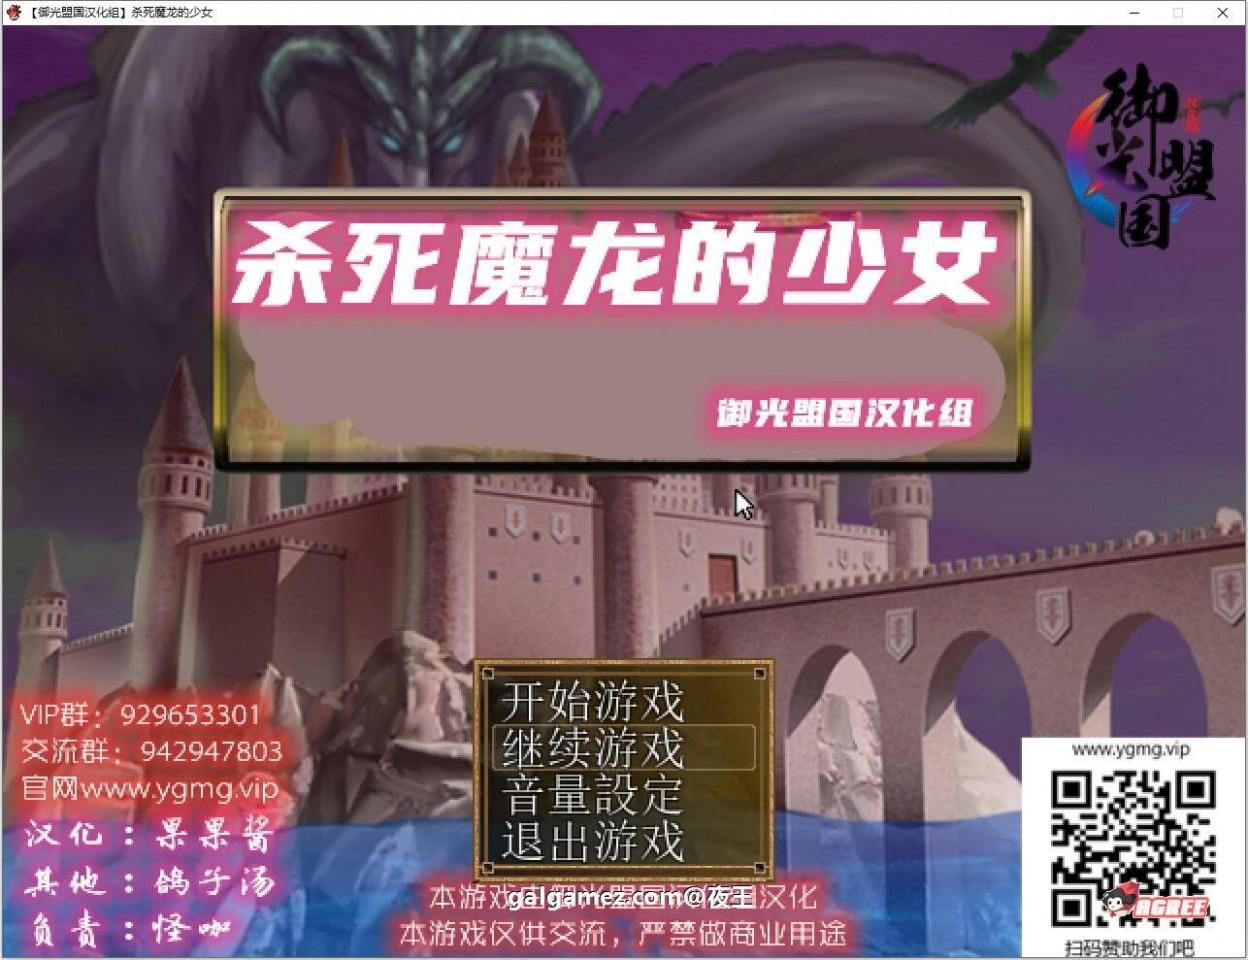 【RPG/汉化/战斗H】杀死魔龙的少女 精翻汉化完结版+CG【新汉化/全CV/500M】